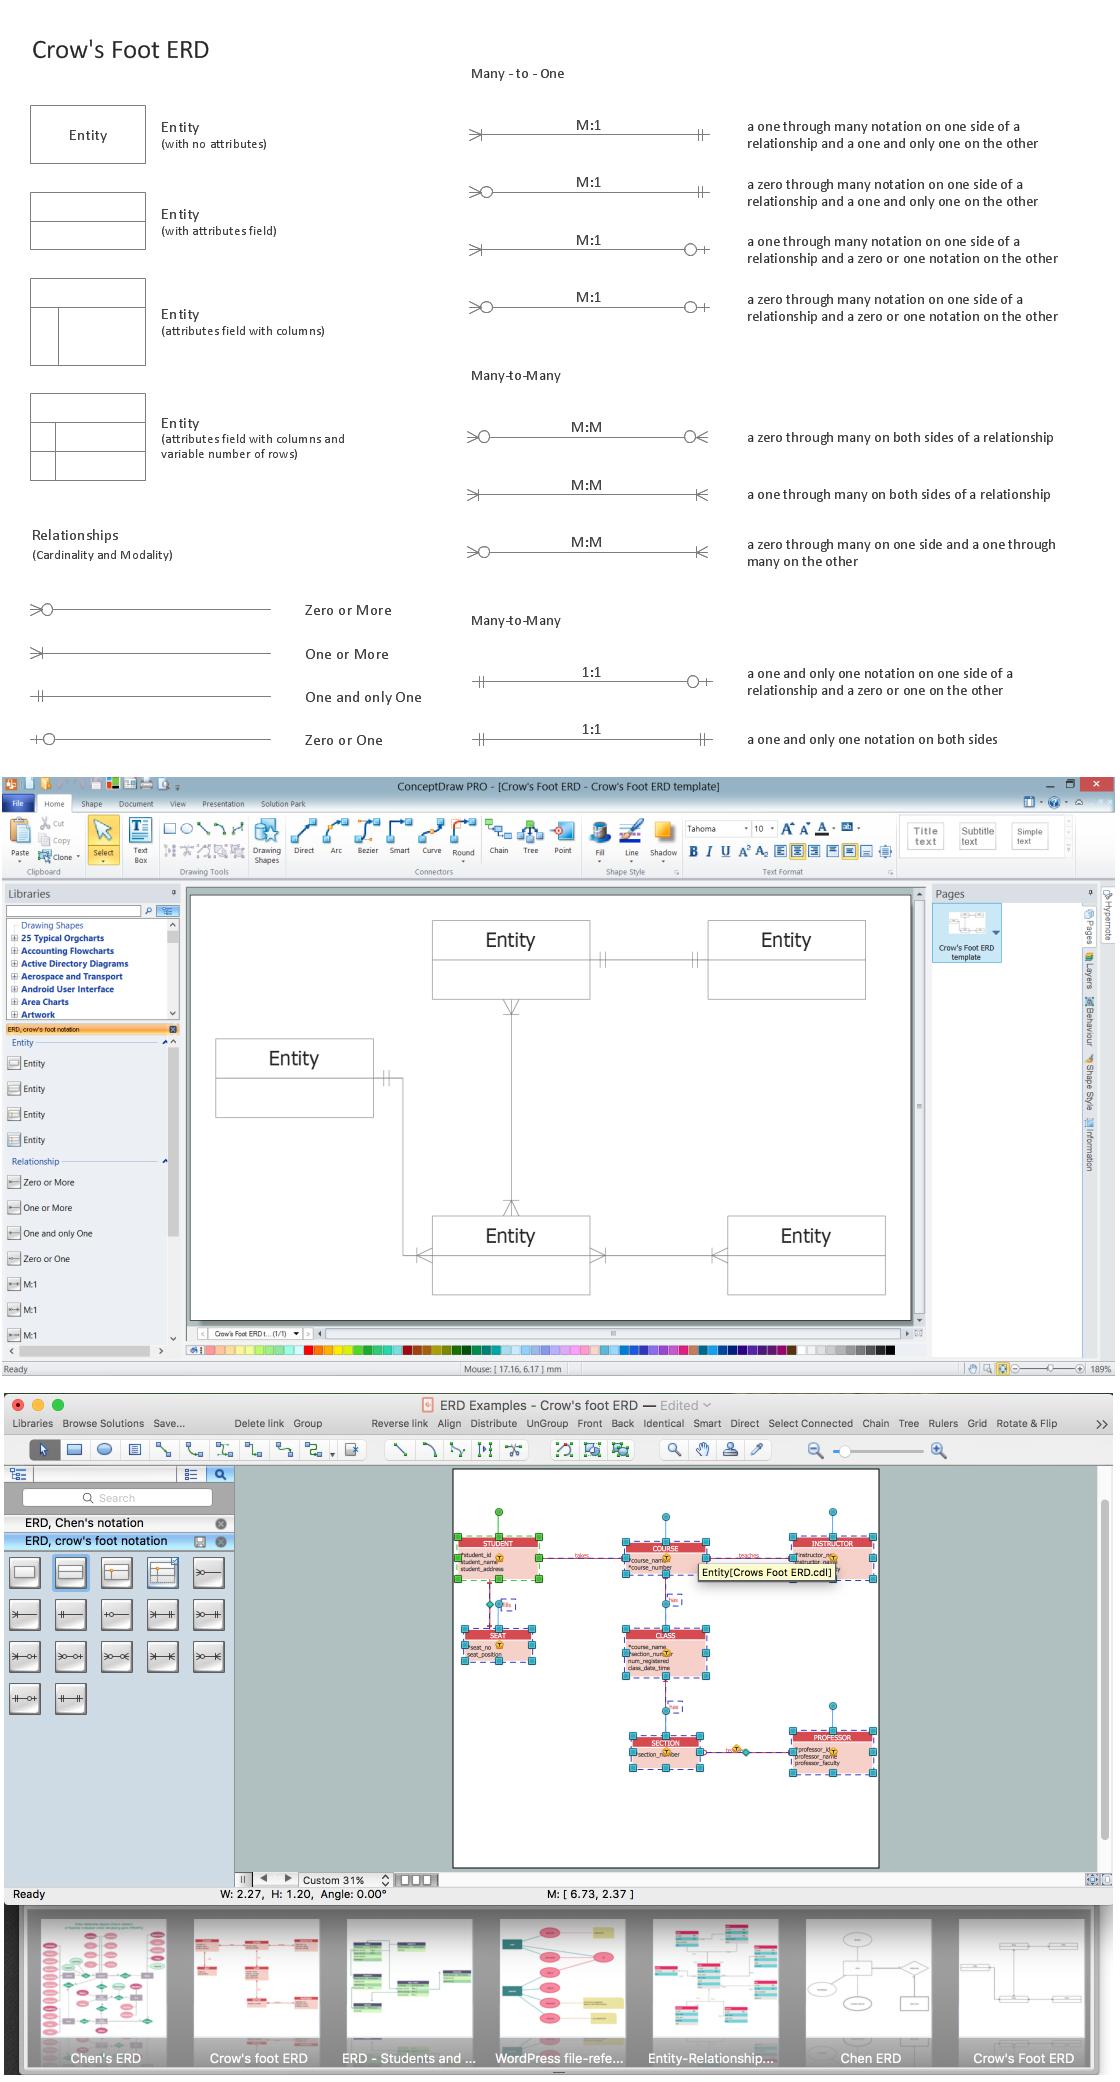 Entity Relationship Diagram - Erd - Software For Design in Er Diagram Visio 2017